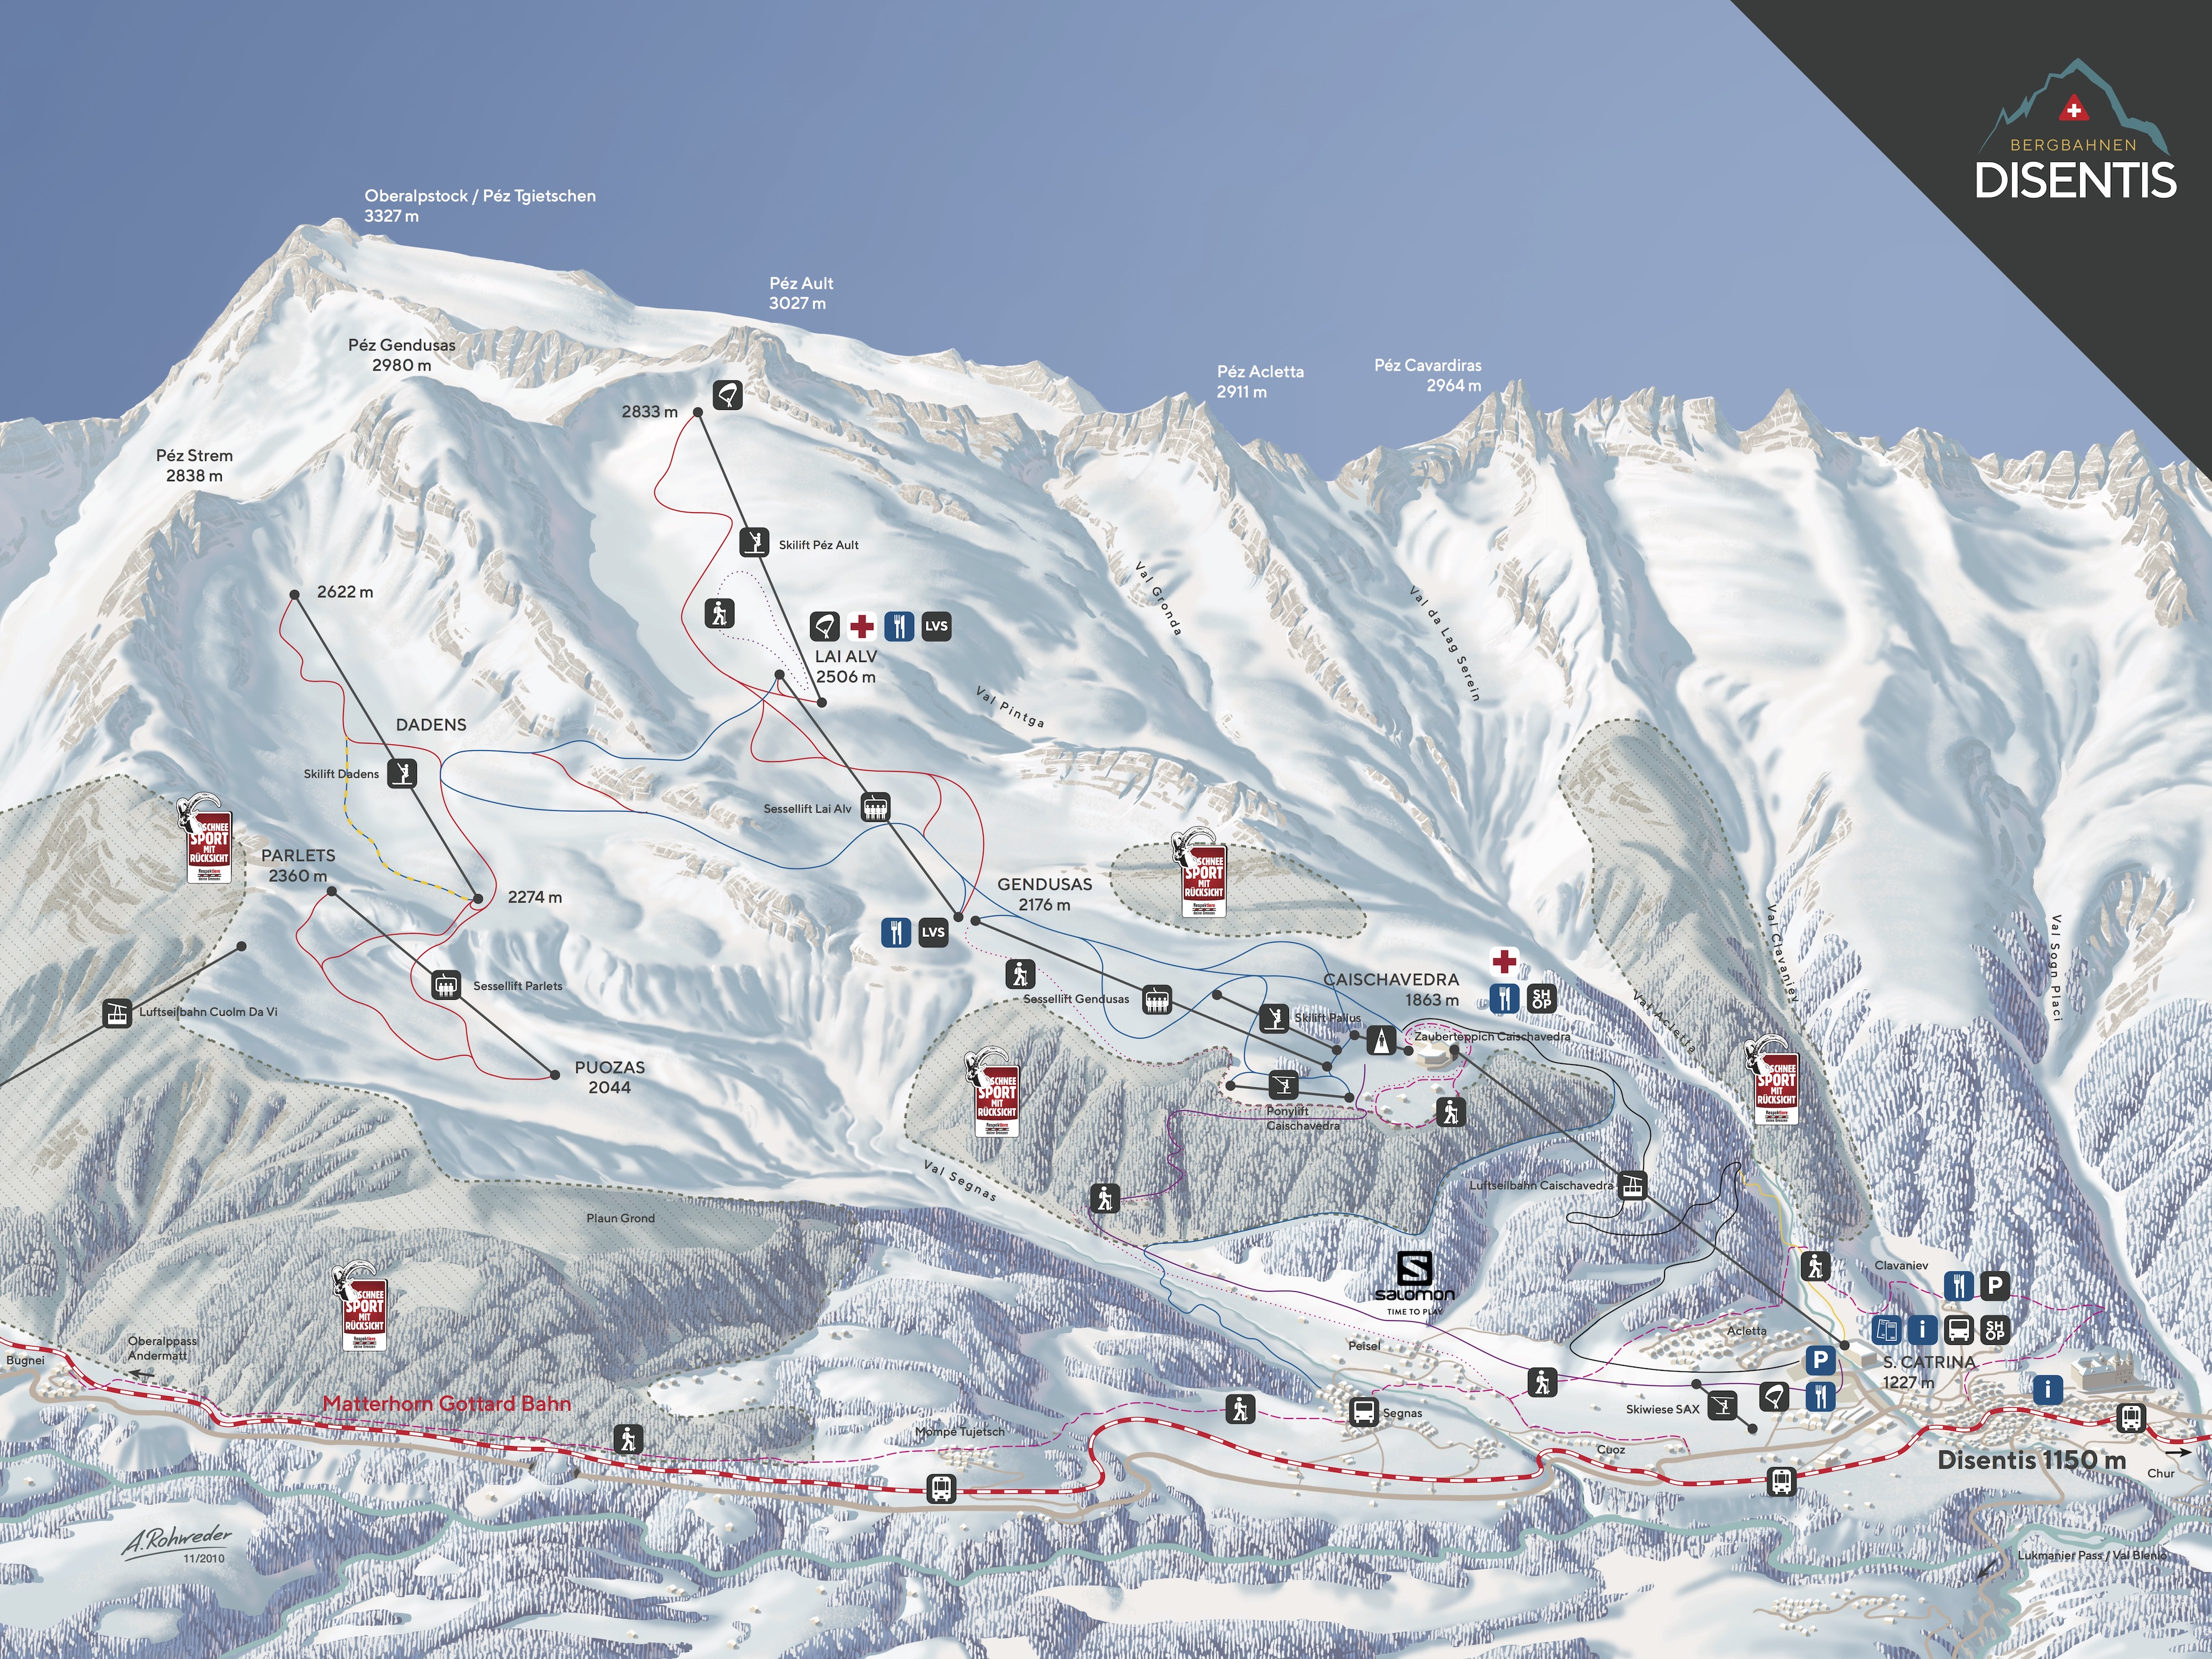 Disentis Piste / Trail Map